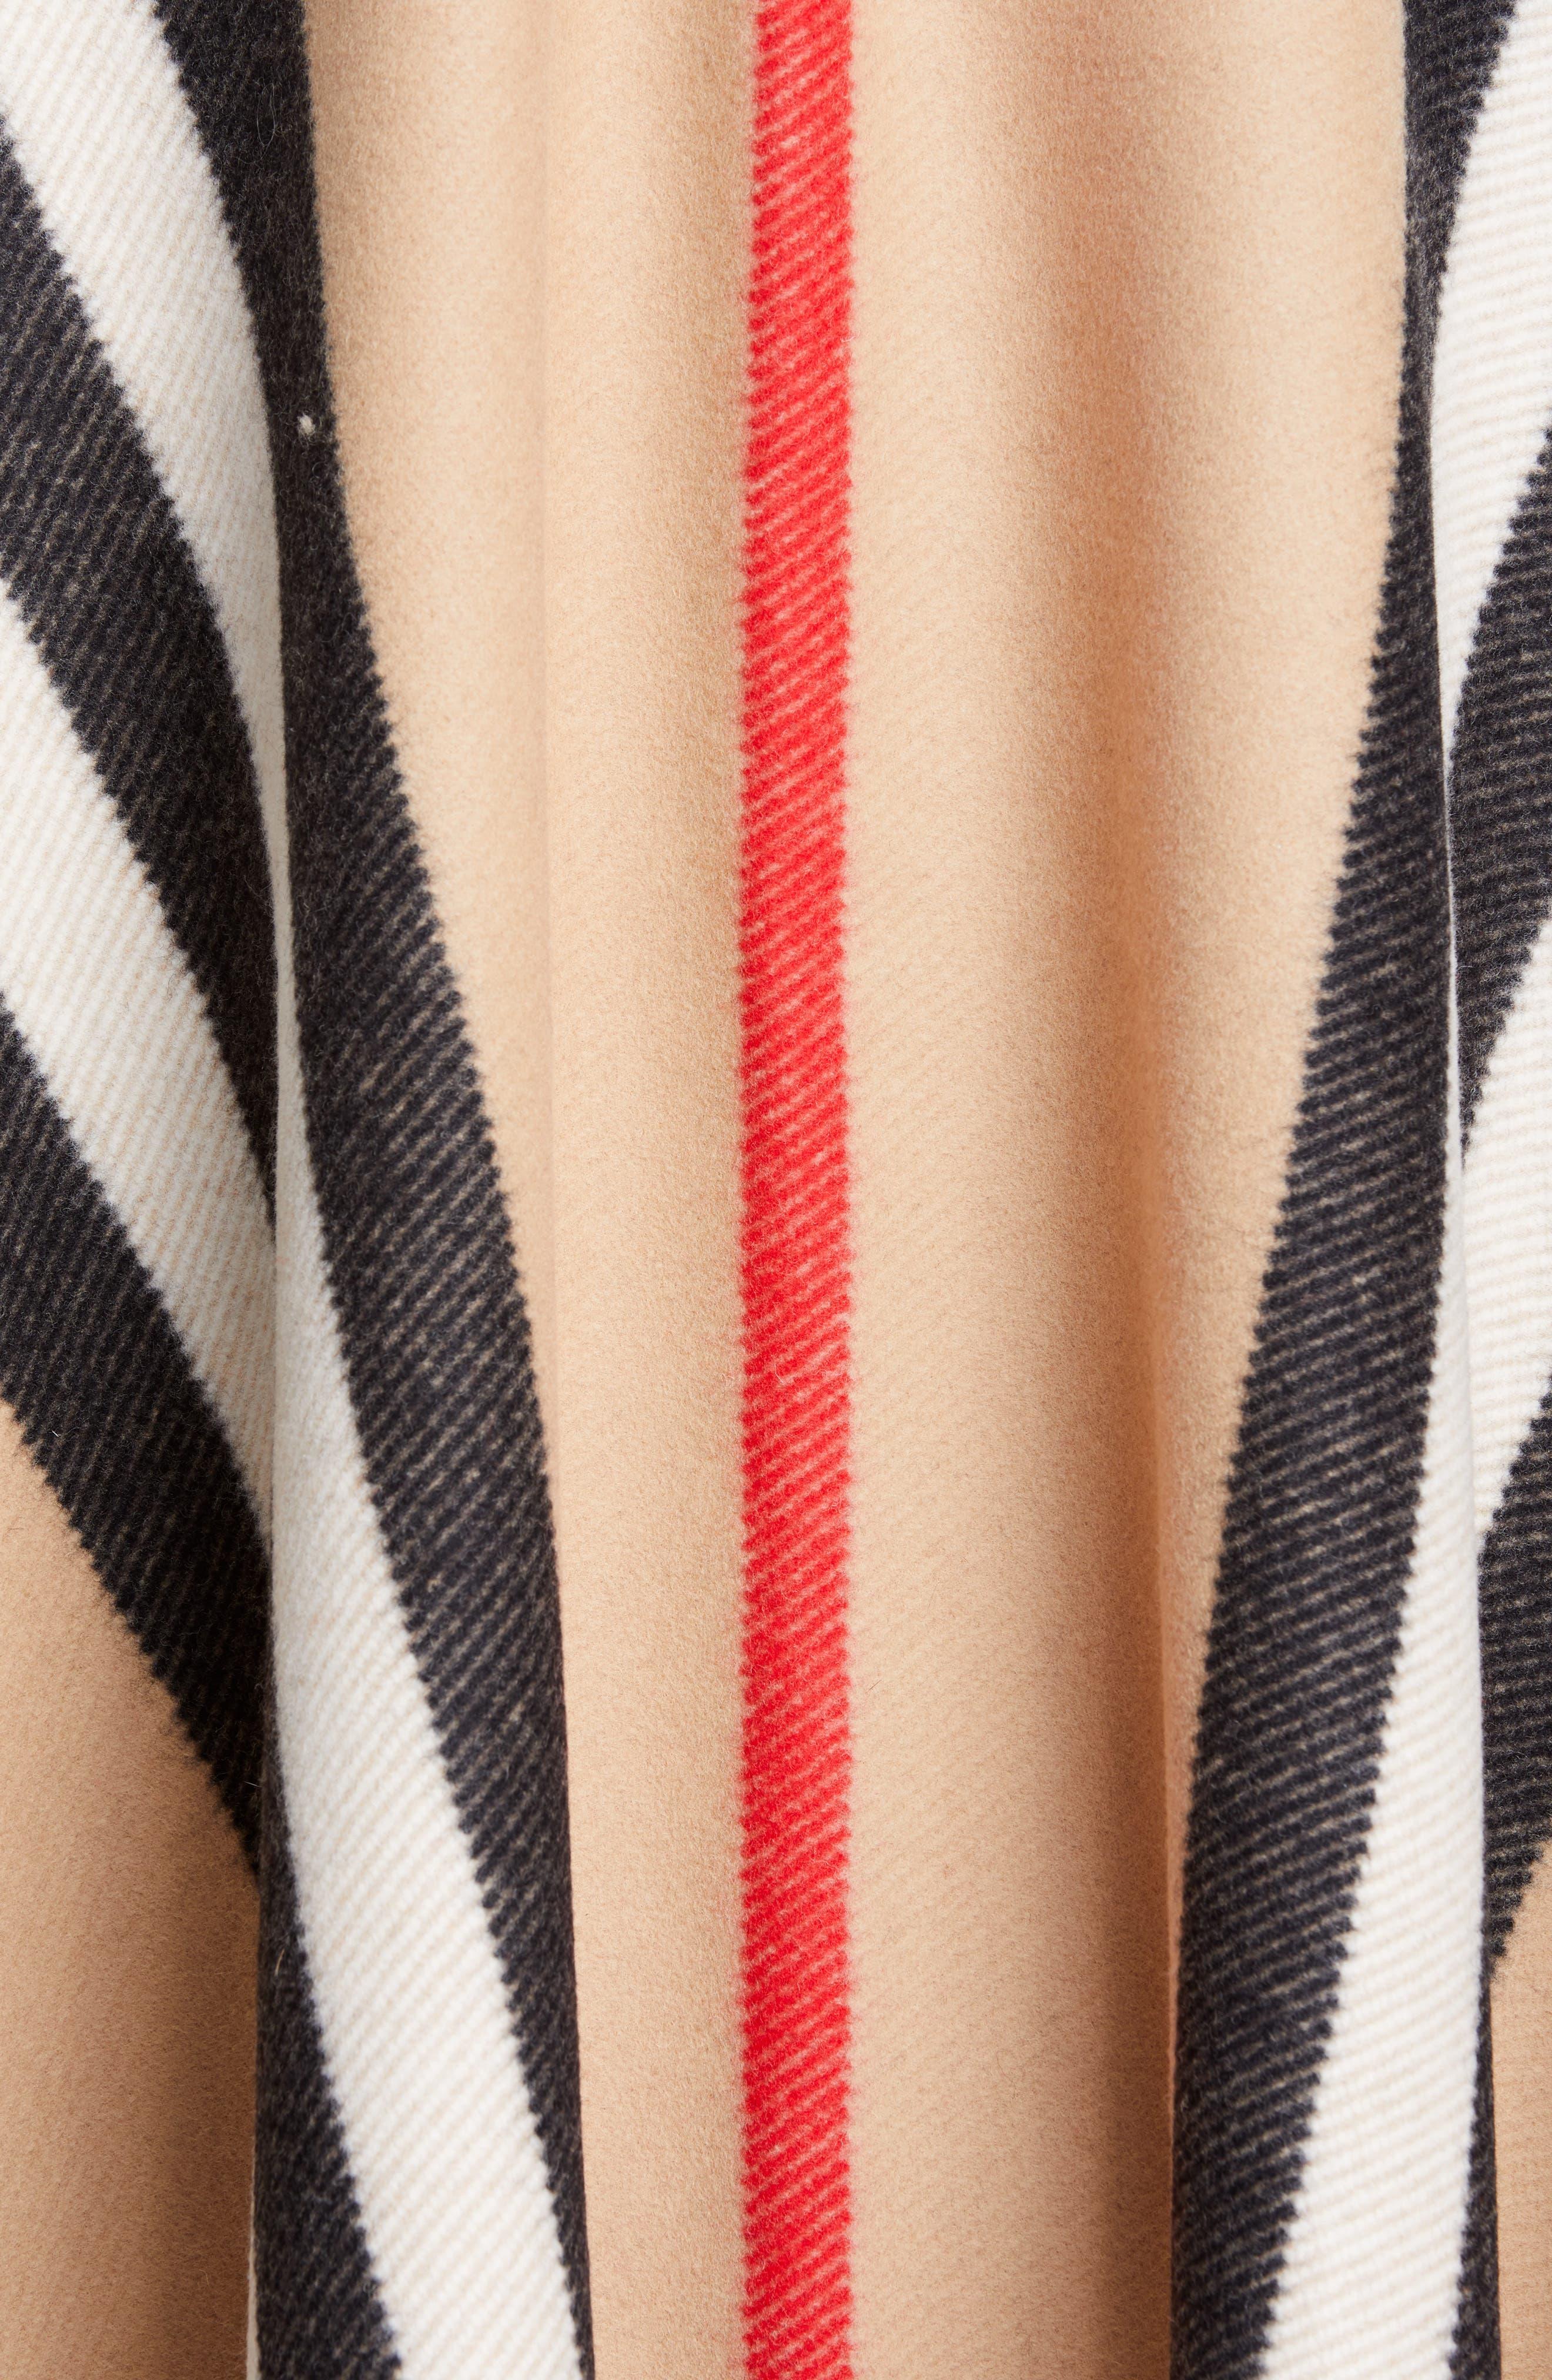 BURBERRY, Stripe Fringe Wool Cape, Alternate thumbnail 5, color, CAMEL